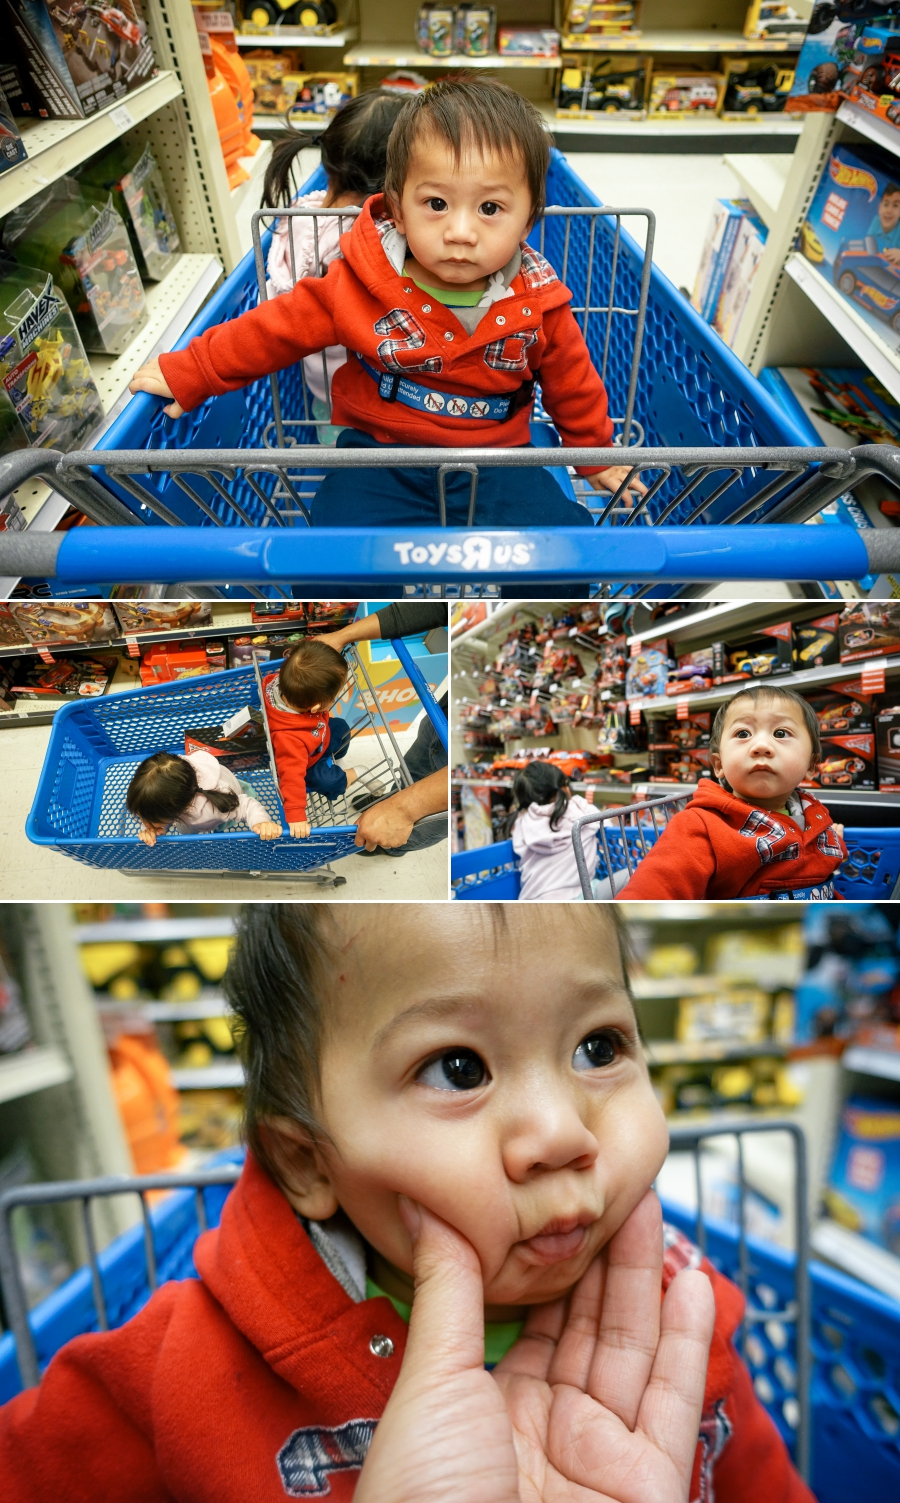 Flores Family Toys R Us - Bay Area Family Photographer 5.jpg